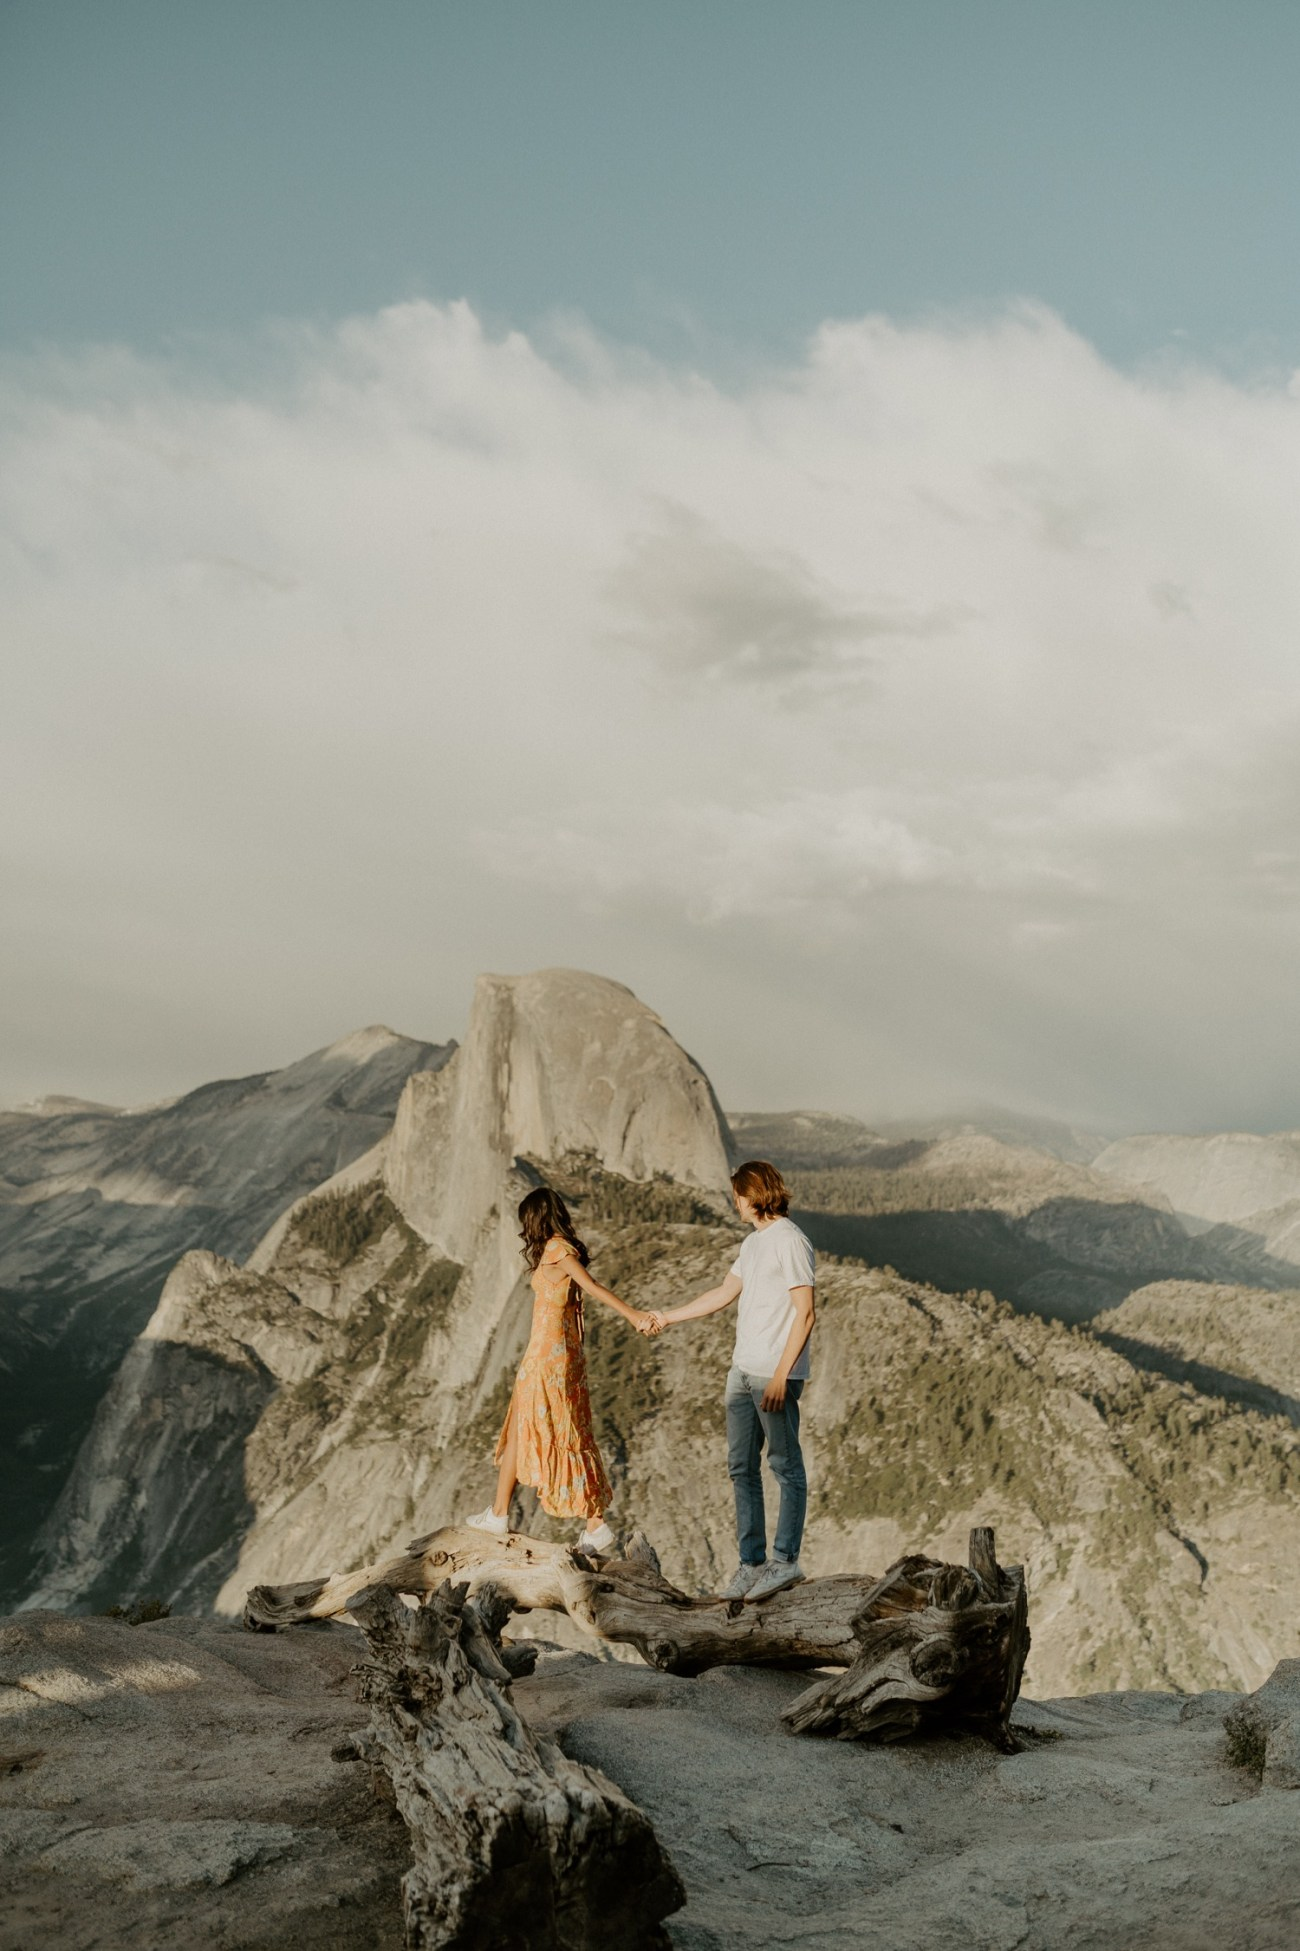 Sunset Yosemite Glacier Point Engagement Session Anais Possamai Photography 06